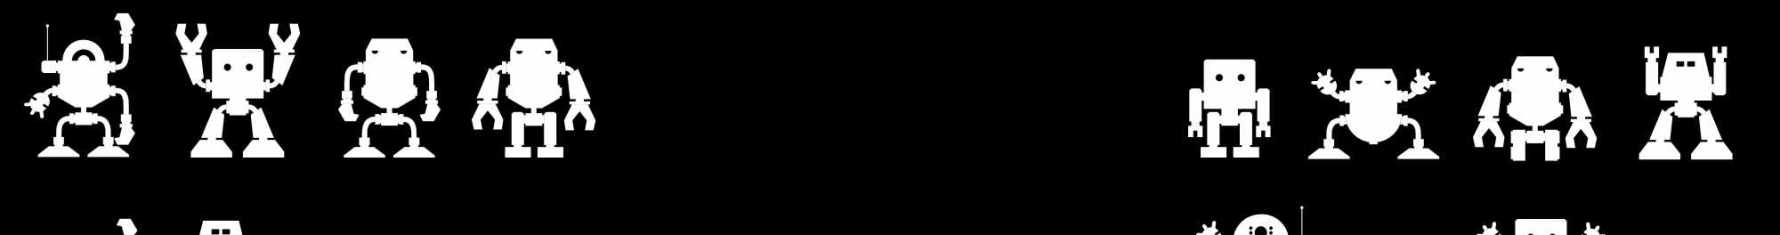 single page image